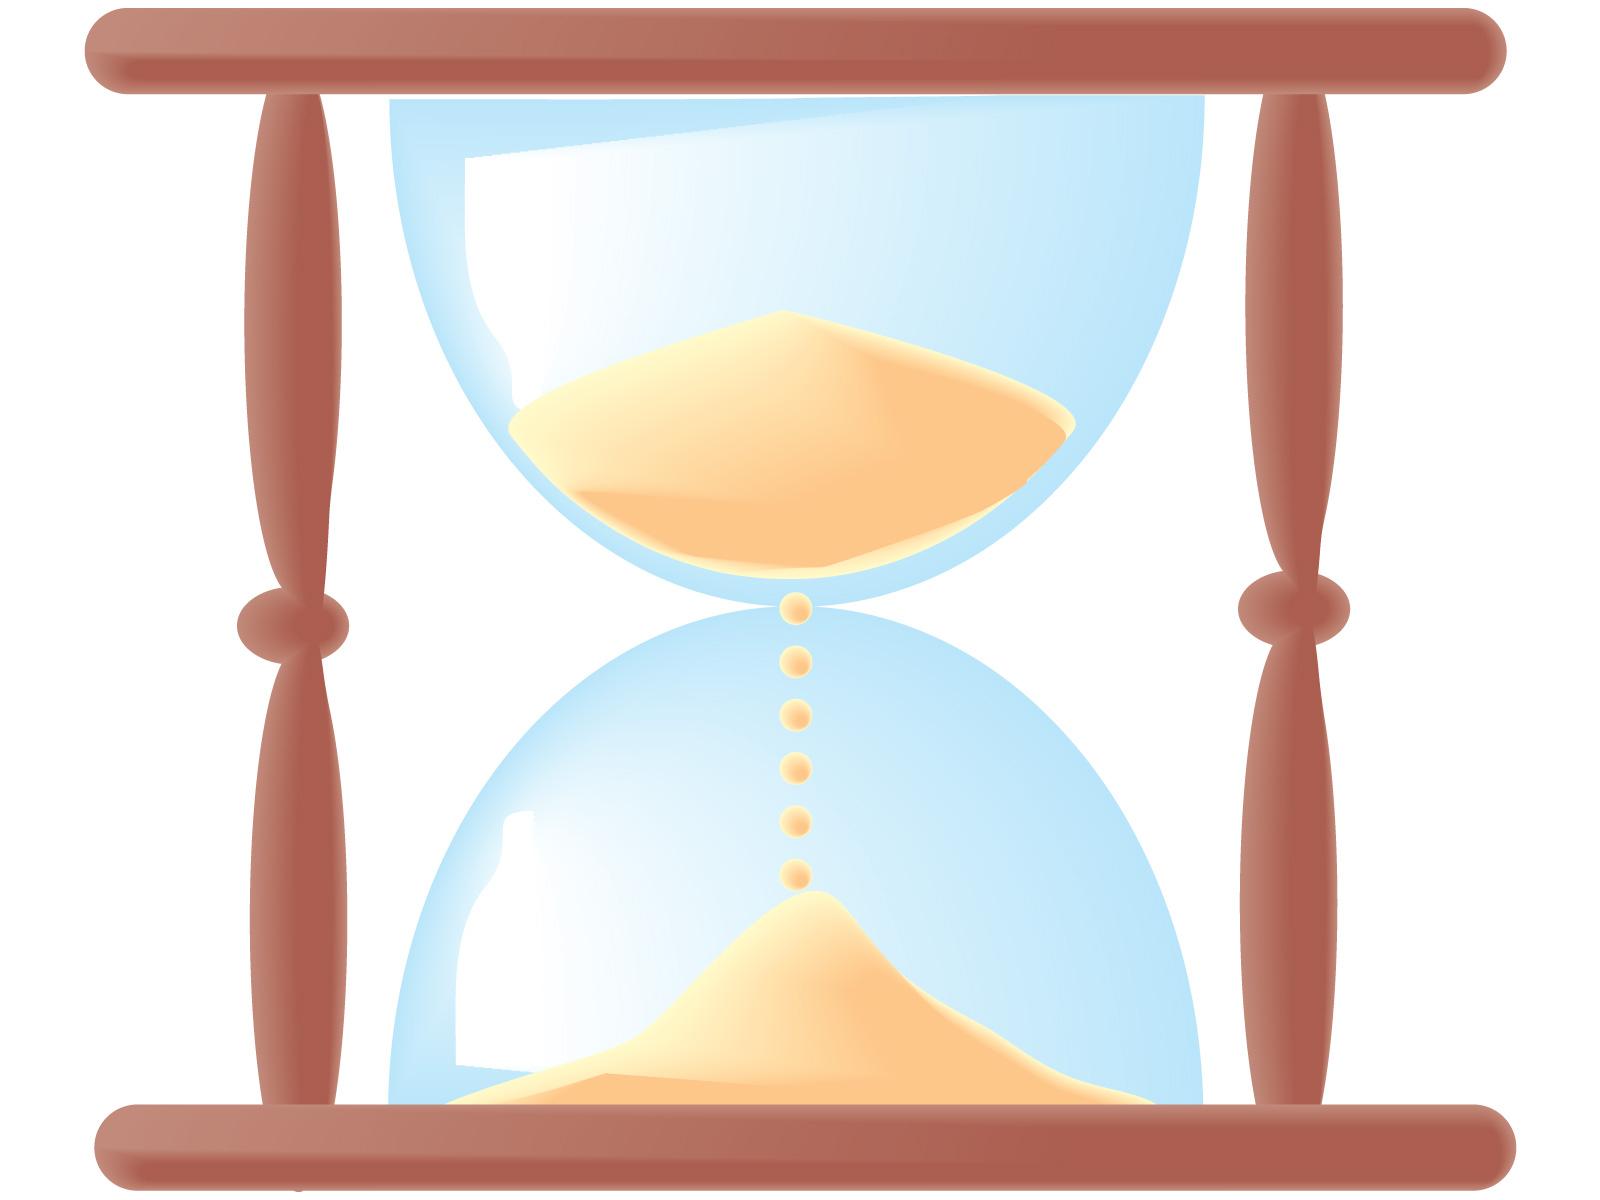 申告期限の延長